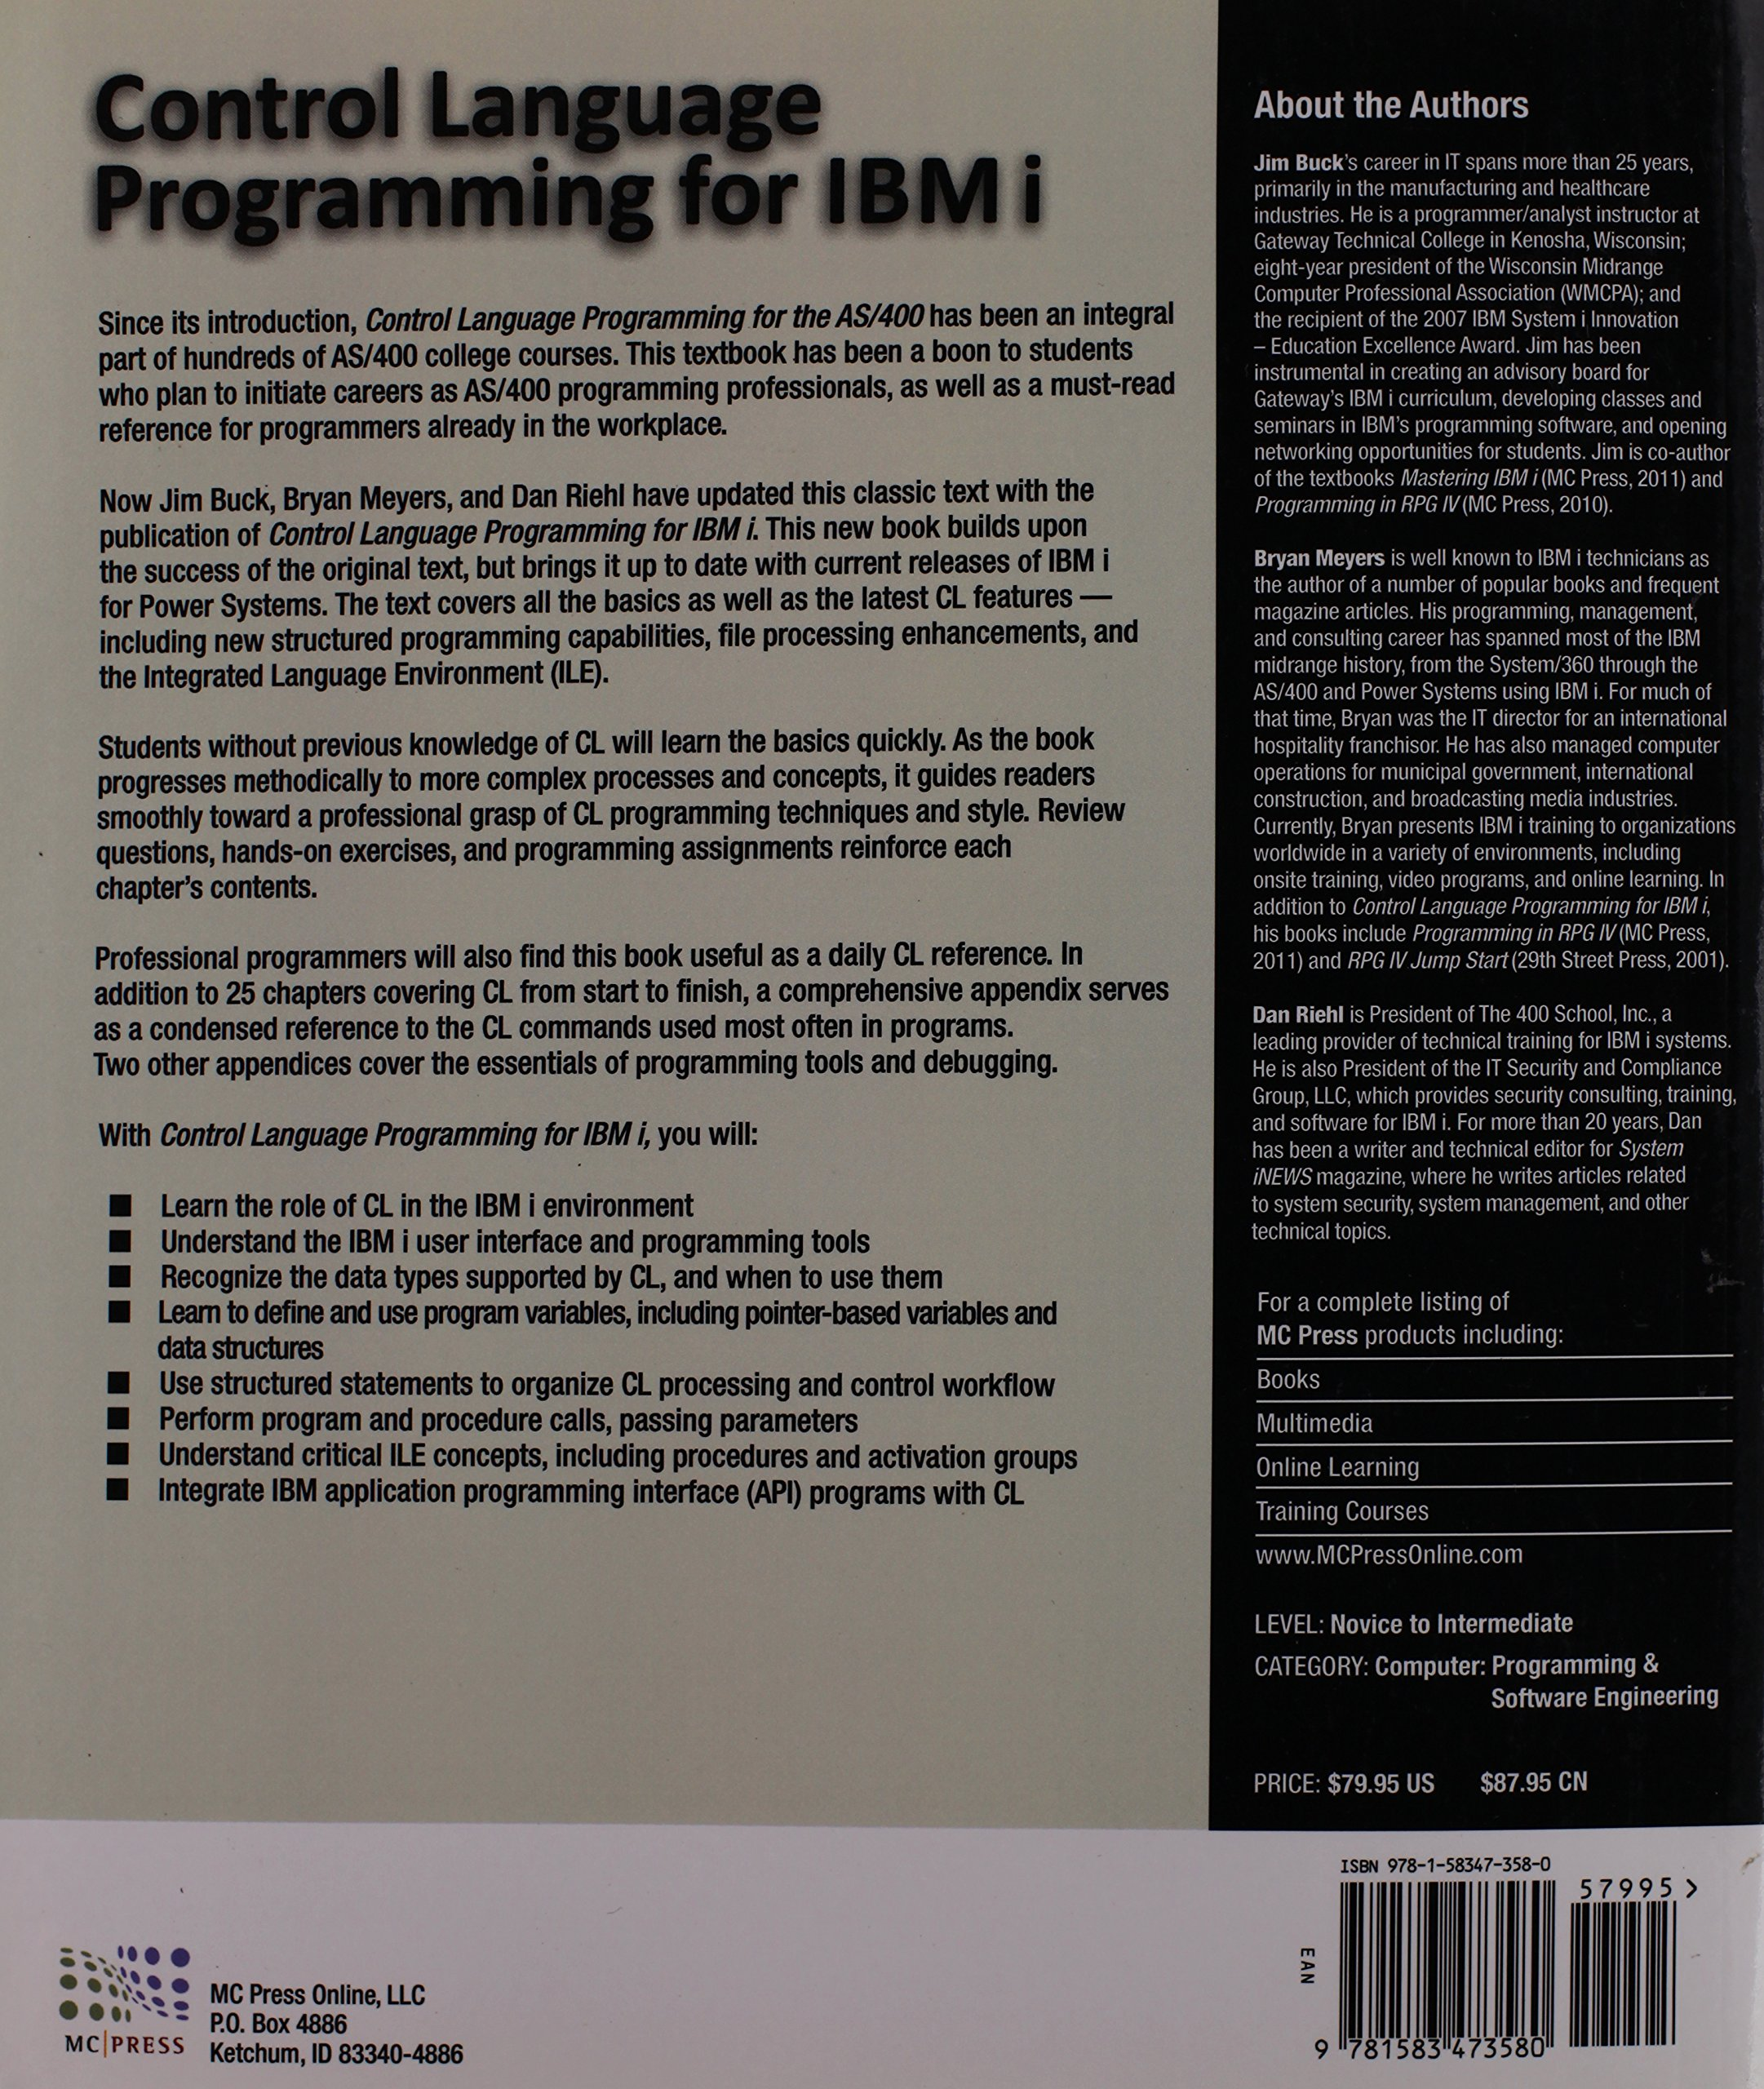 Control Language Programming for IBM i by Mc Press